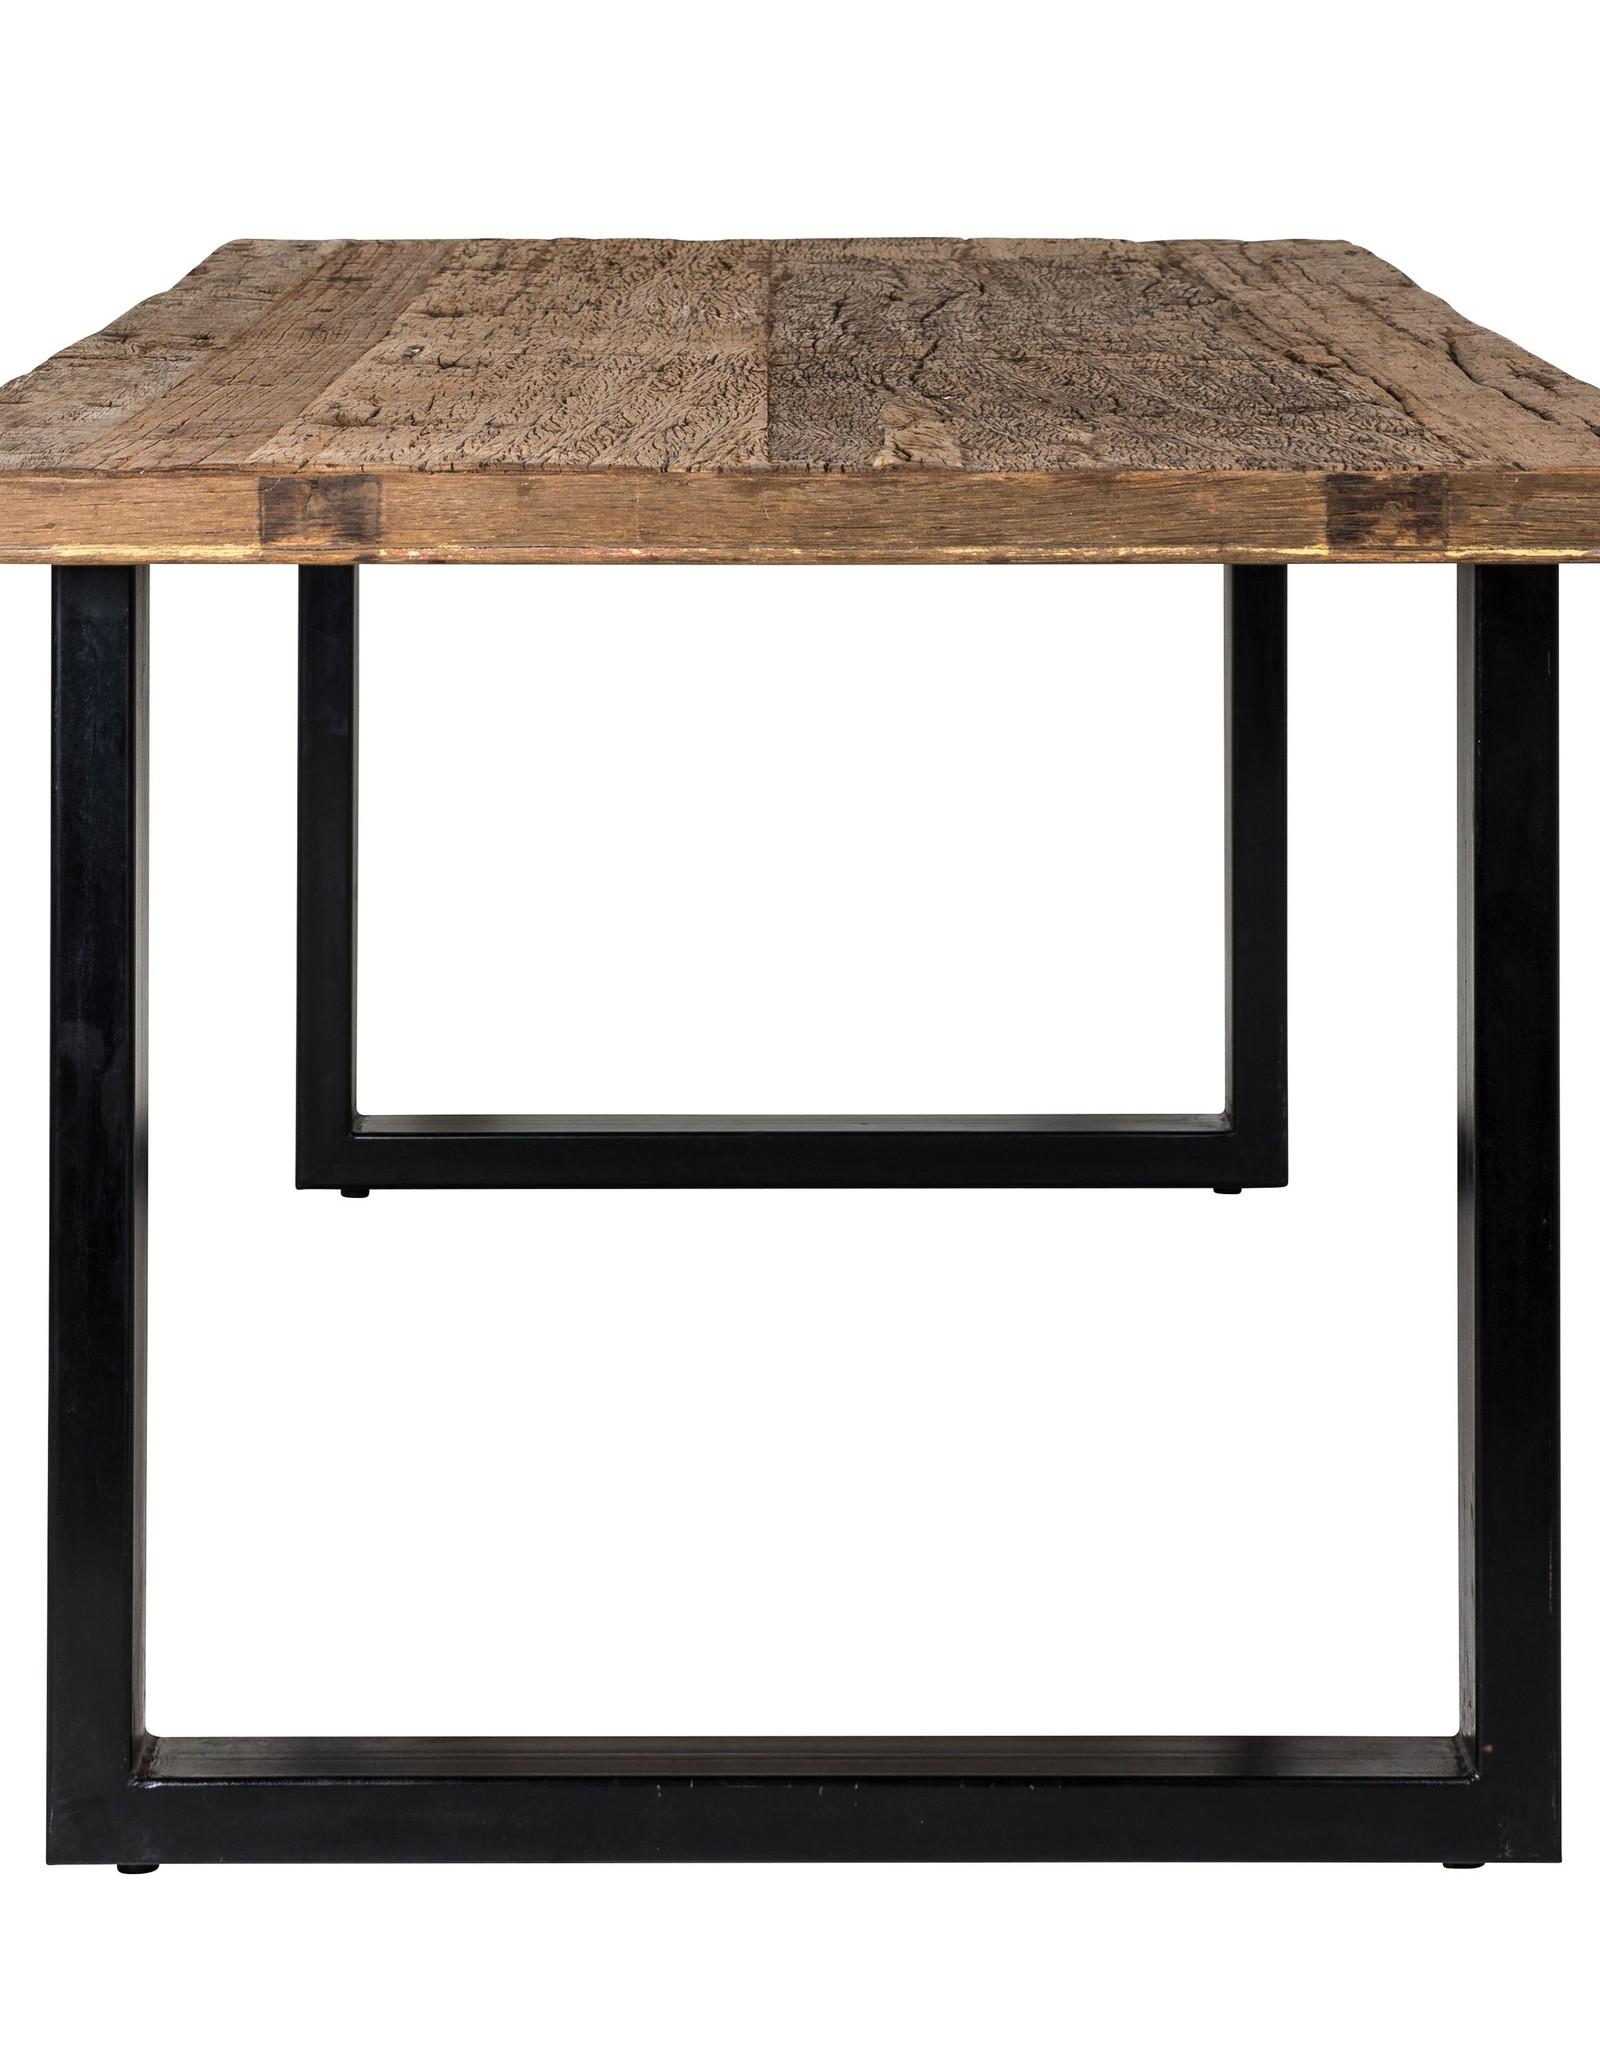 Richmond Interiors Eettafel Raffles 240, gerecyceld hout